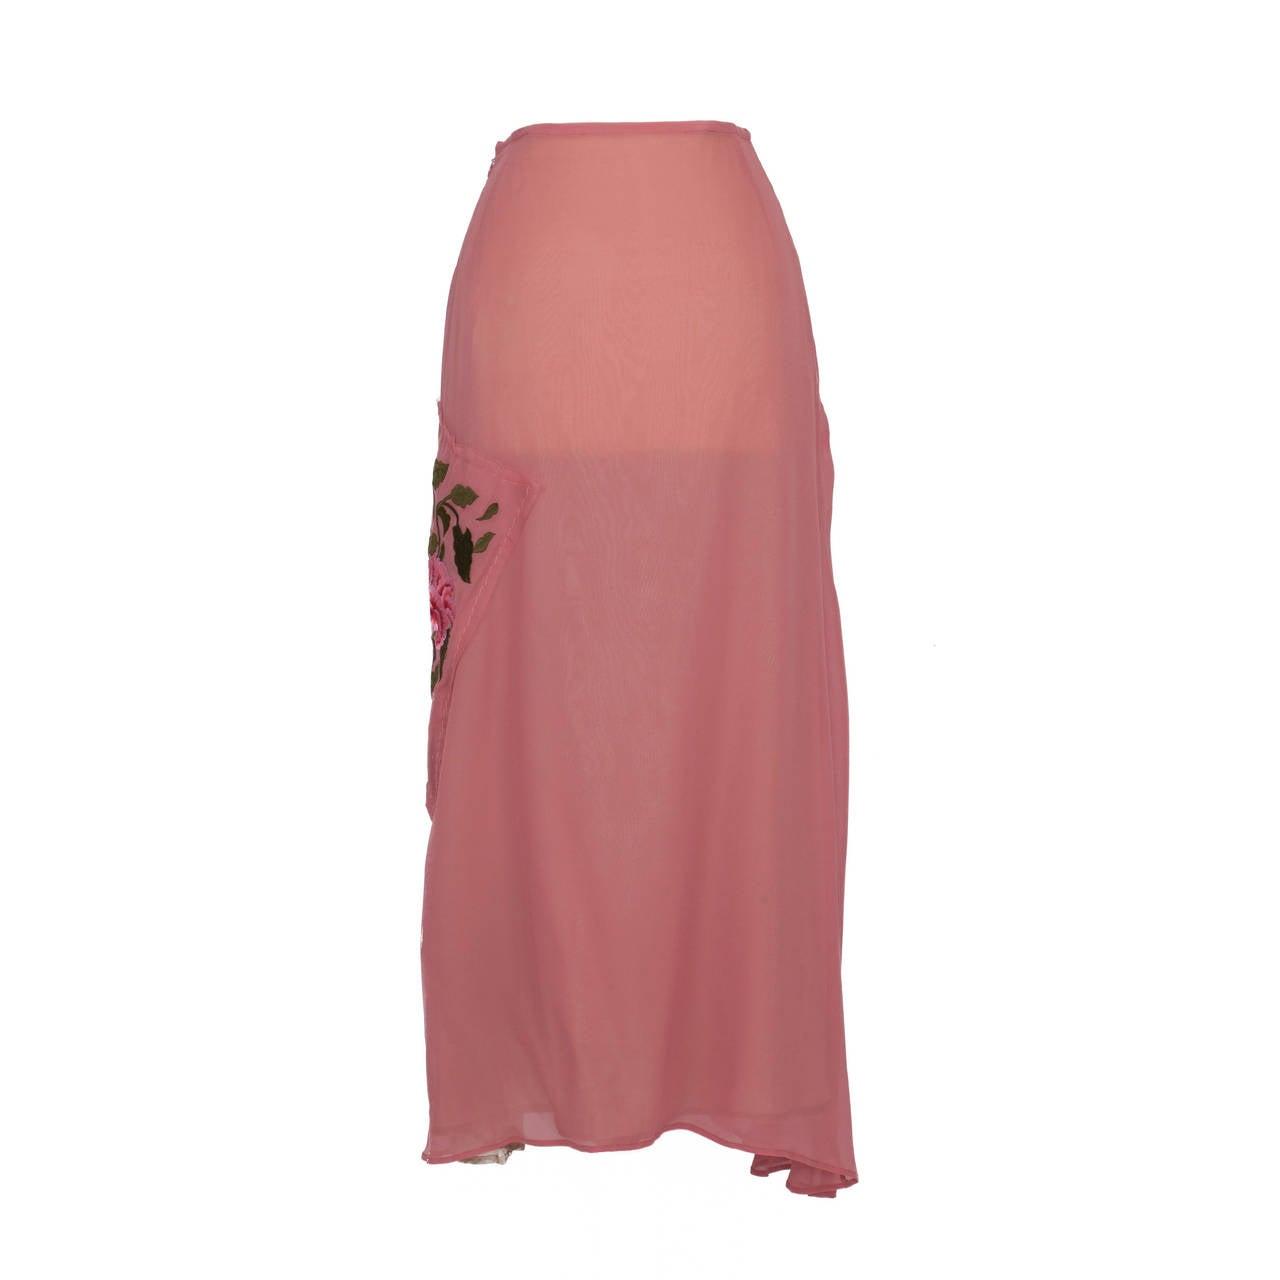 Yohji Yamamoto + Noir Pink Skirt Flower Embroidery For Sale 1